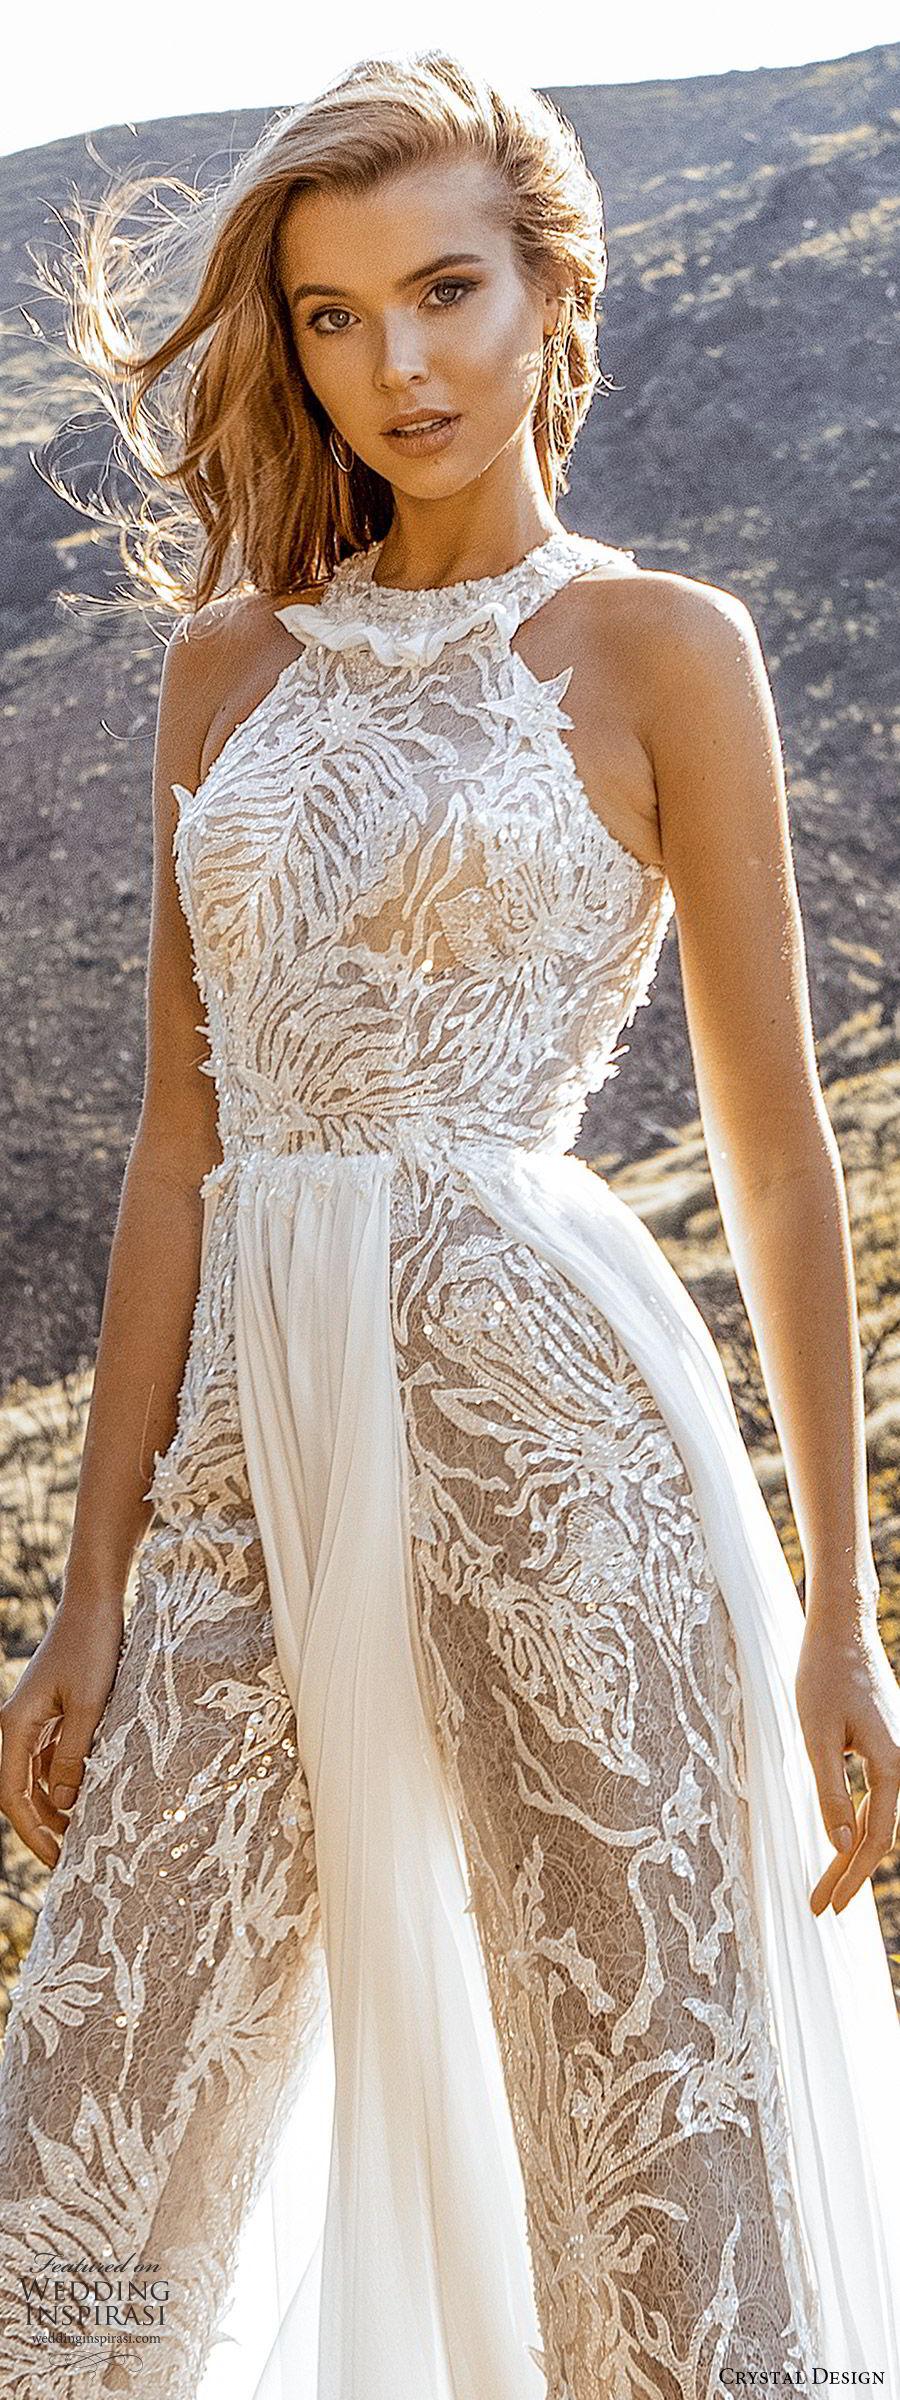 crystal design 2020 couture bridal sleeveless halter neckline jumpsuit wedding dress a line skirt slit (5) modern chic romantic lv